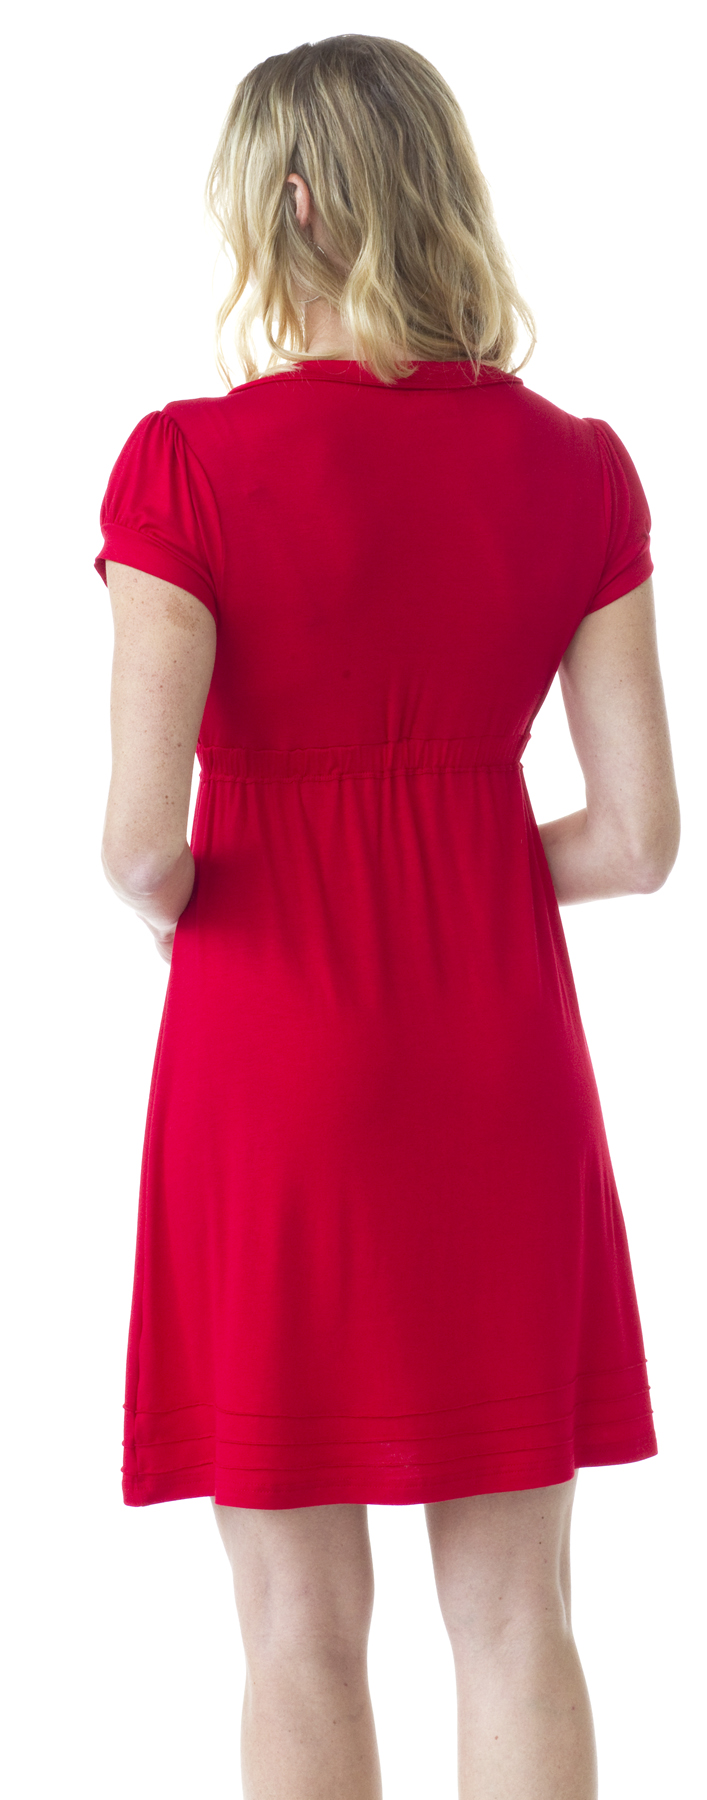 nixilu-coquette-nursing-dress-red-back.jpg